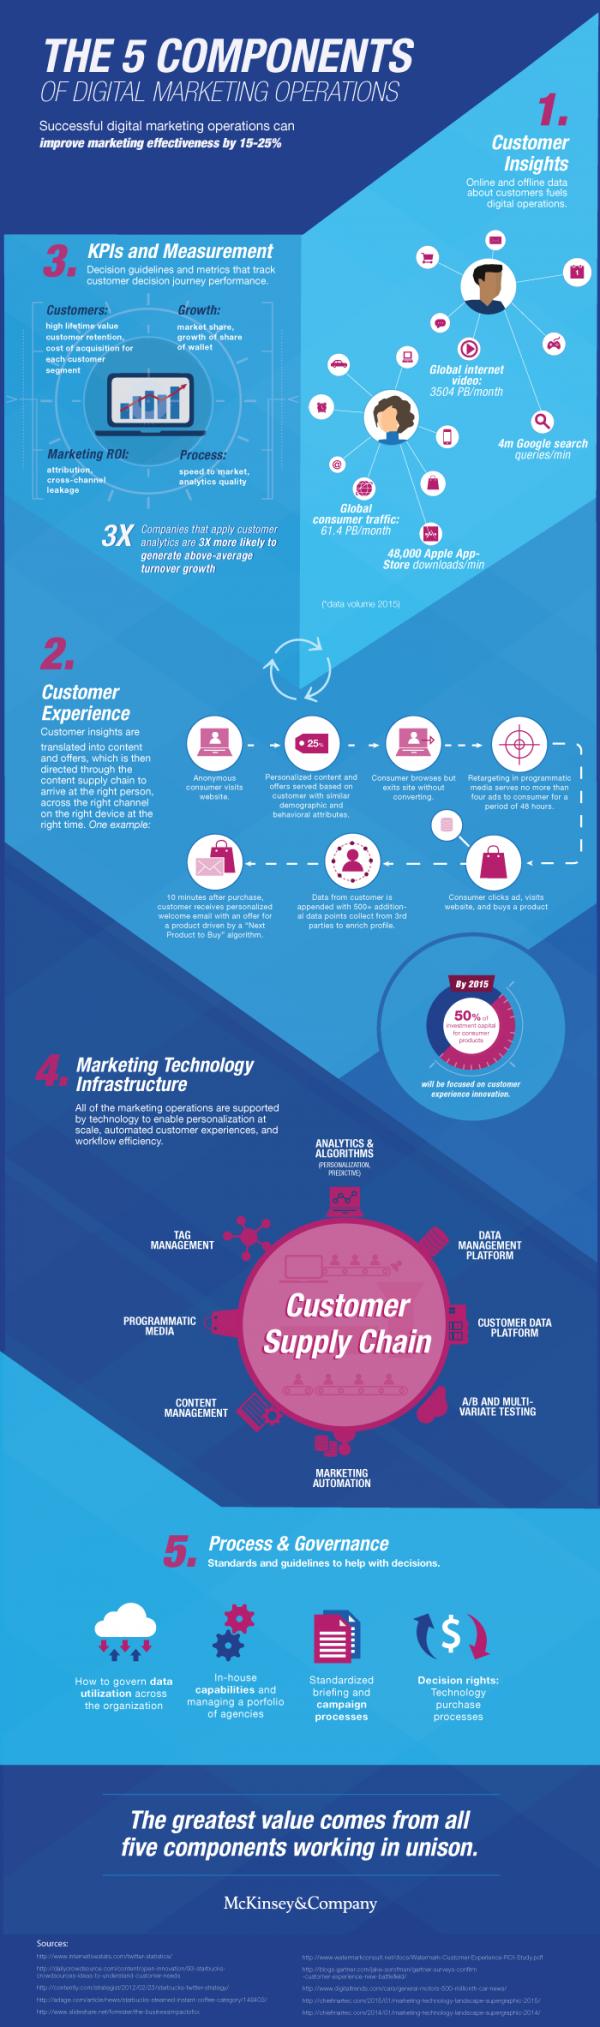 McKinsey-DMO-Infographic